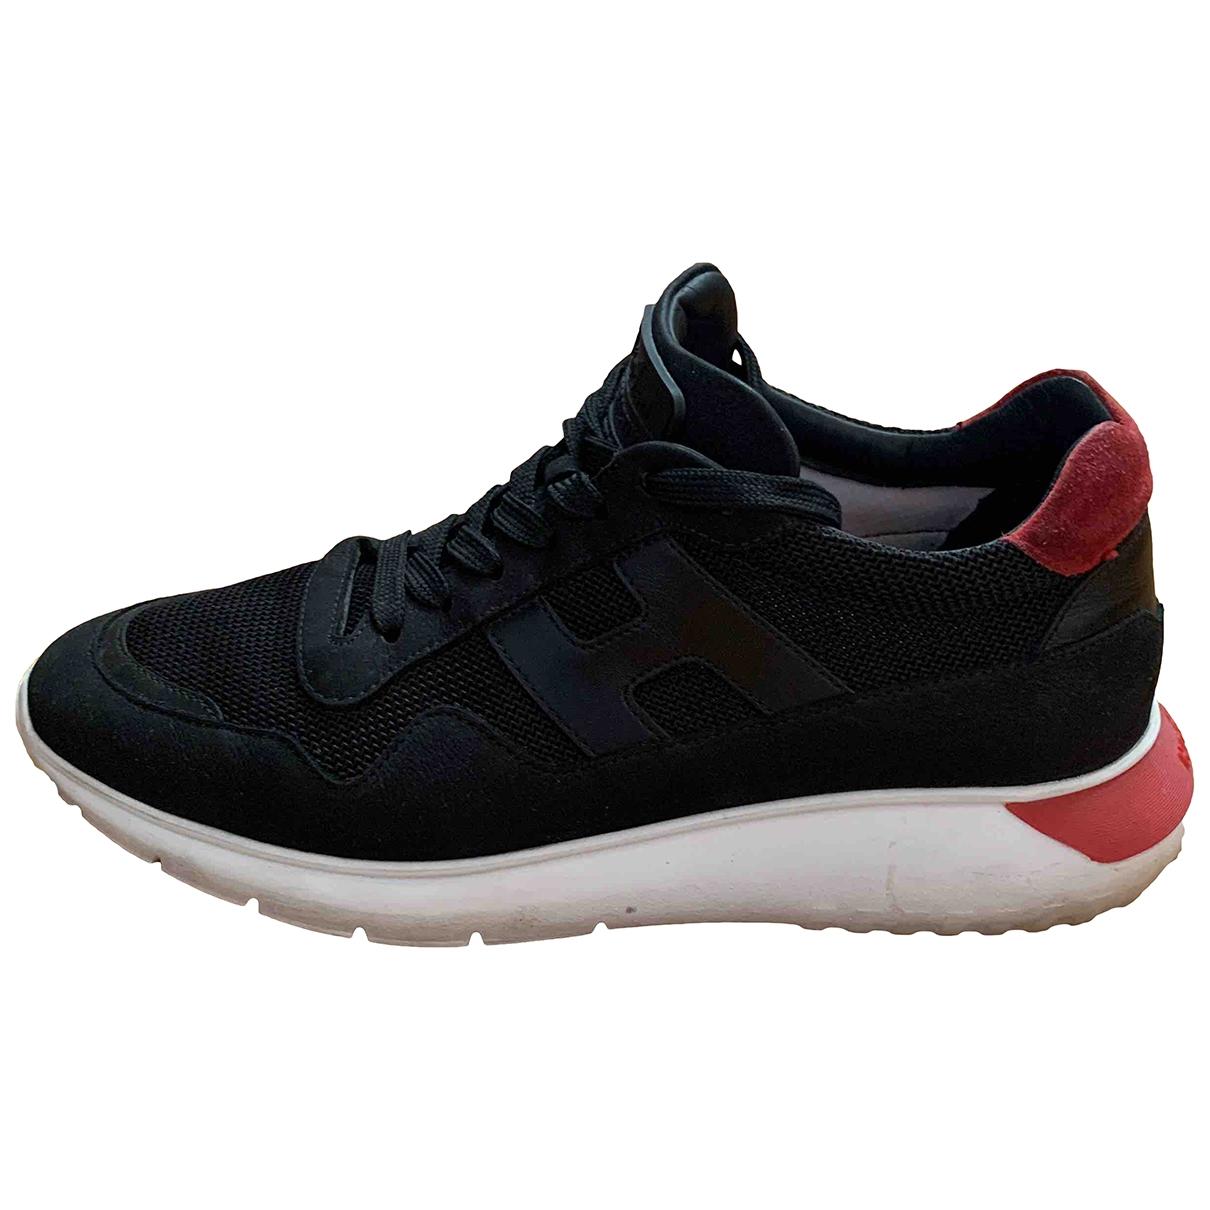 Hogan \N Sneakers in  Schwarz Leinen